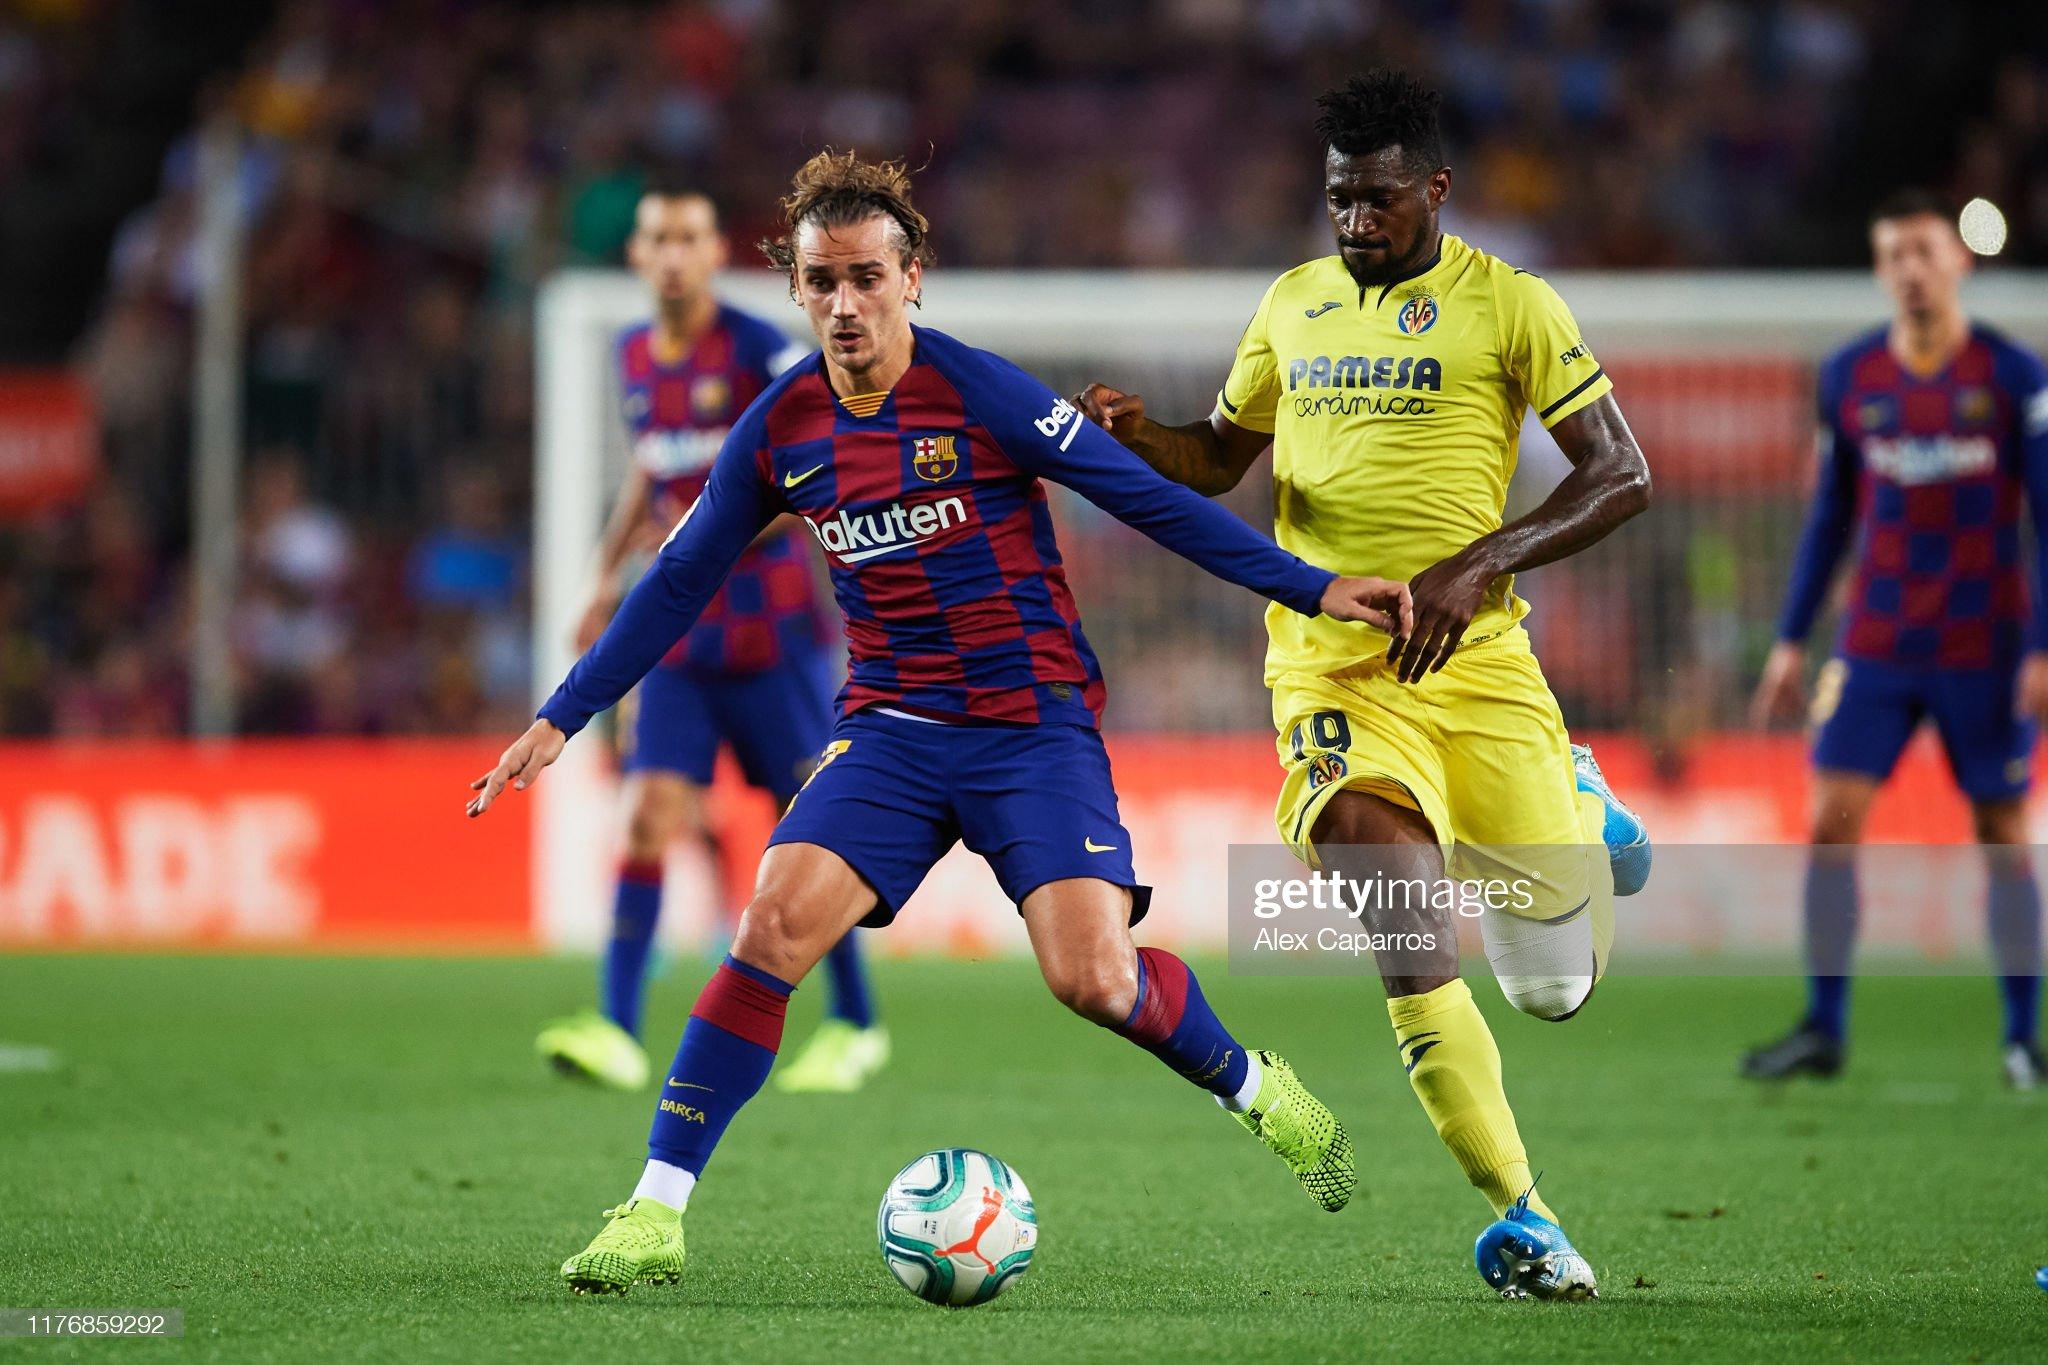 صور مباراة : برشلونة - فياريال 2-1 ( 24-09-2019 )  Antoine-griezmann-of-fc-barcelona-conducts-the-ball-under-pressure-picture-id1176859292?s=2048x2048